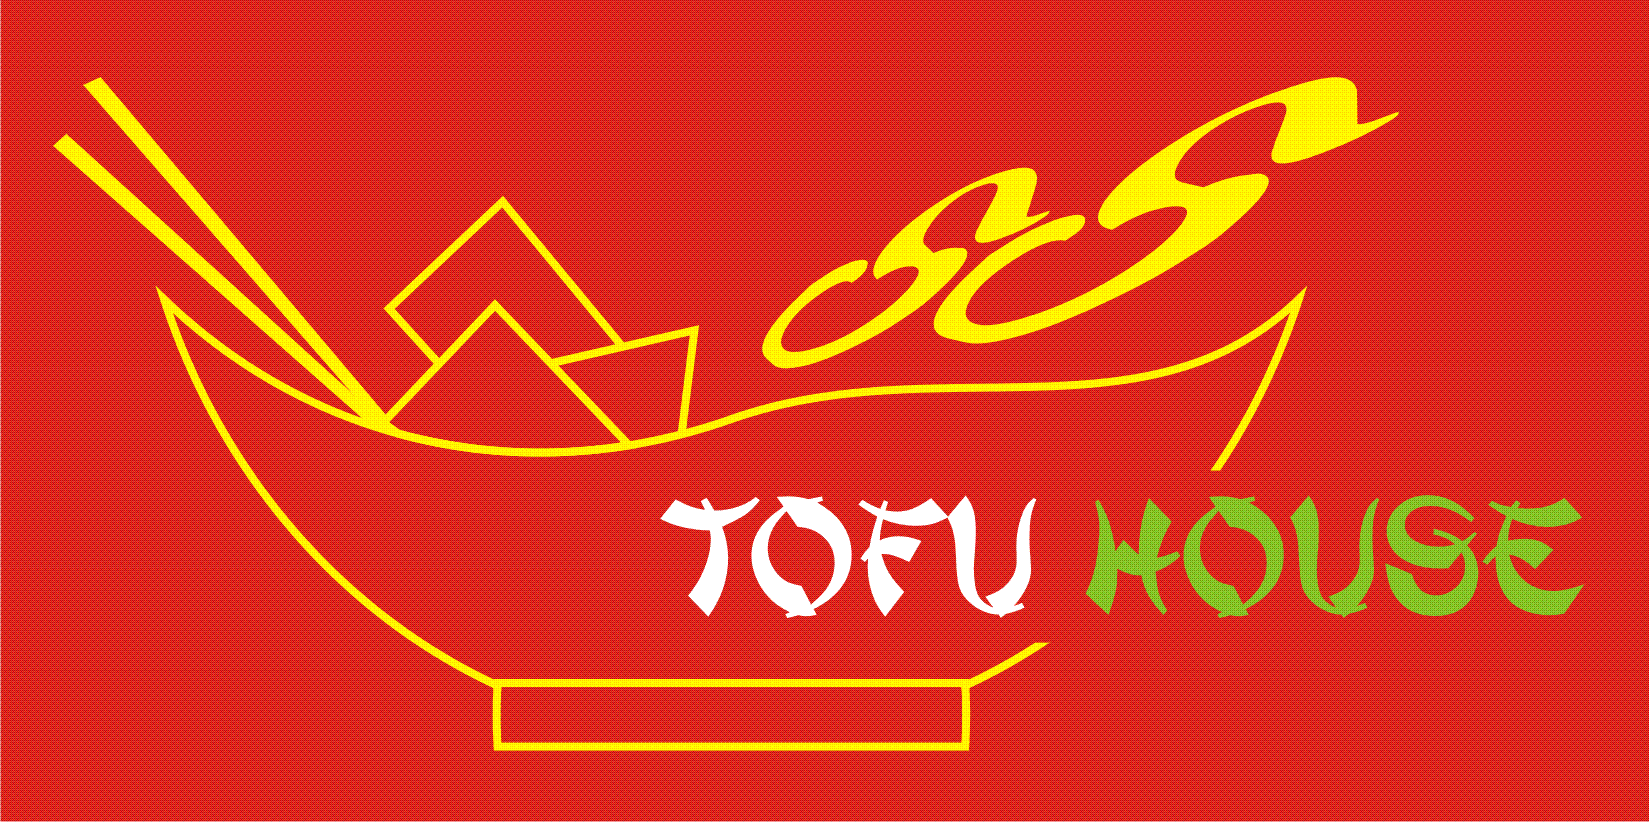 20110702010215 1008